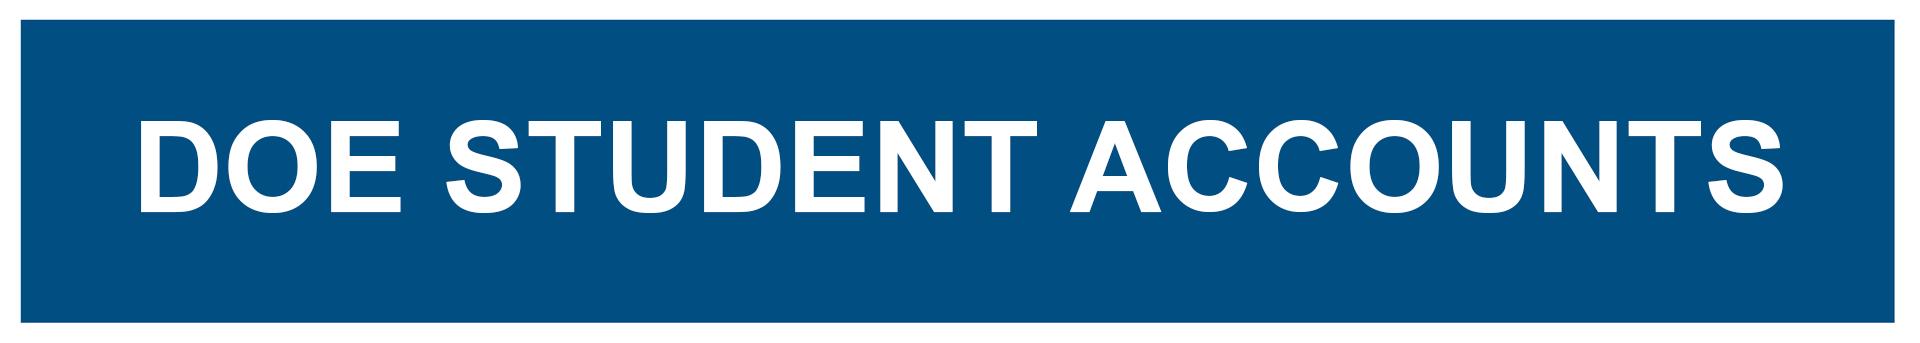 DOE Student Accounts